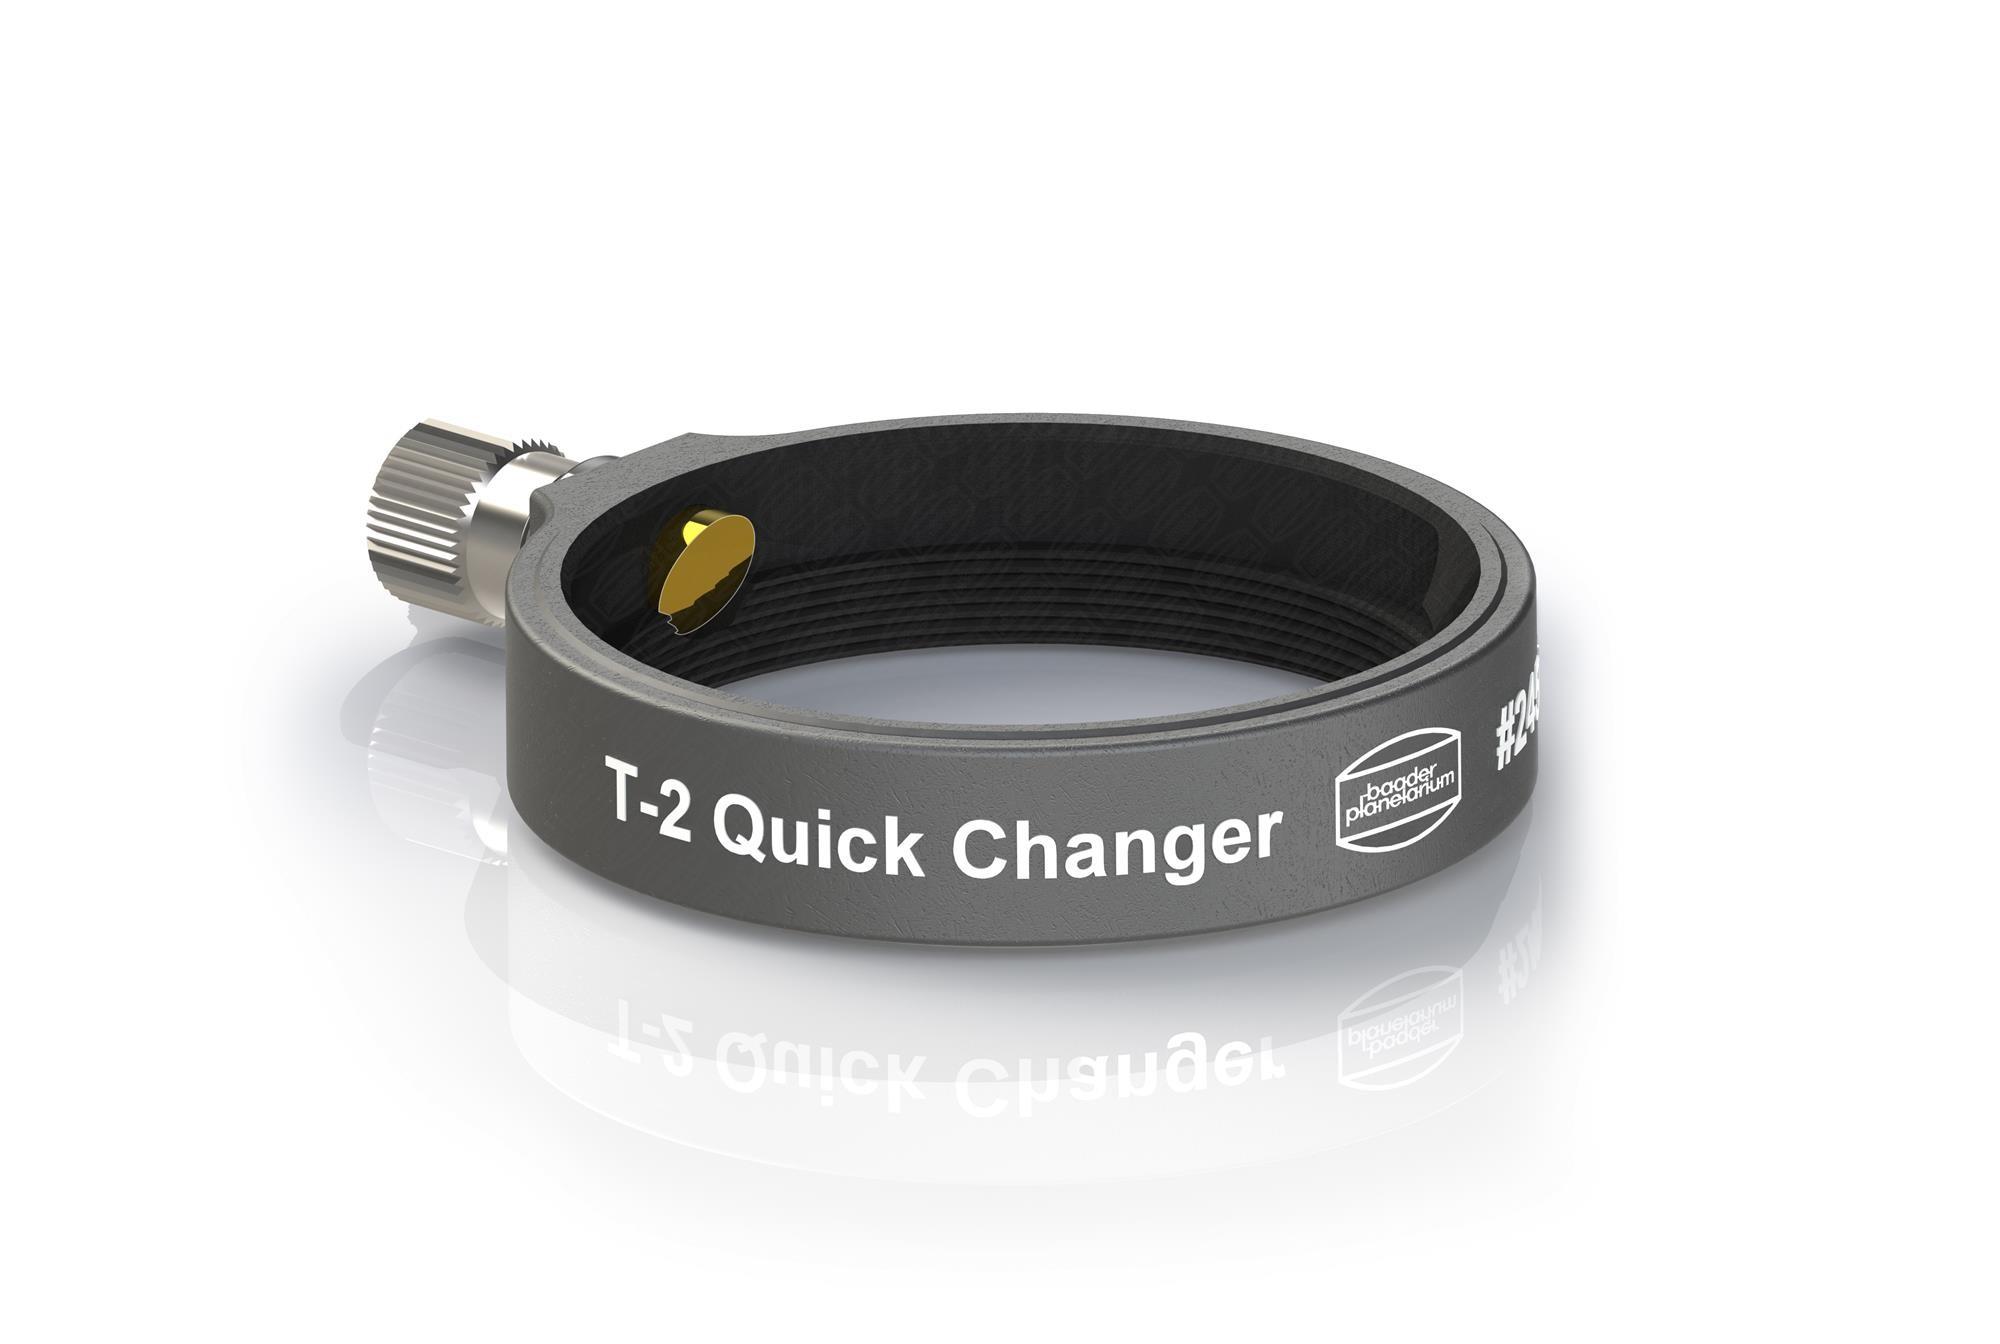 Baader Heavy Duty T-2 QuickChanger (T-2 part #06A)